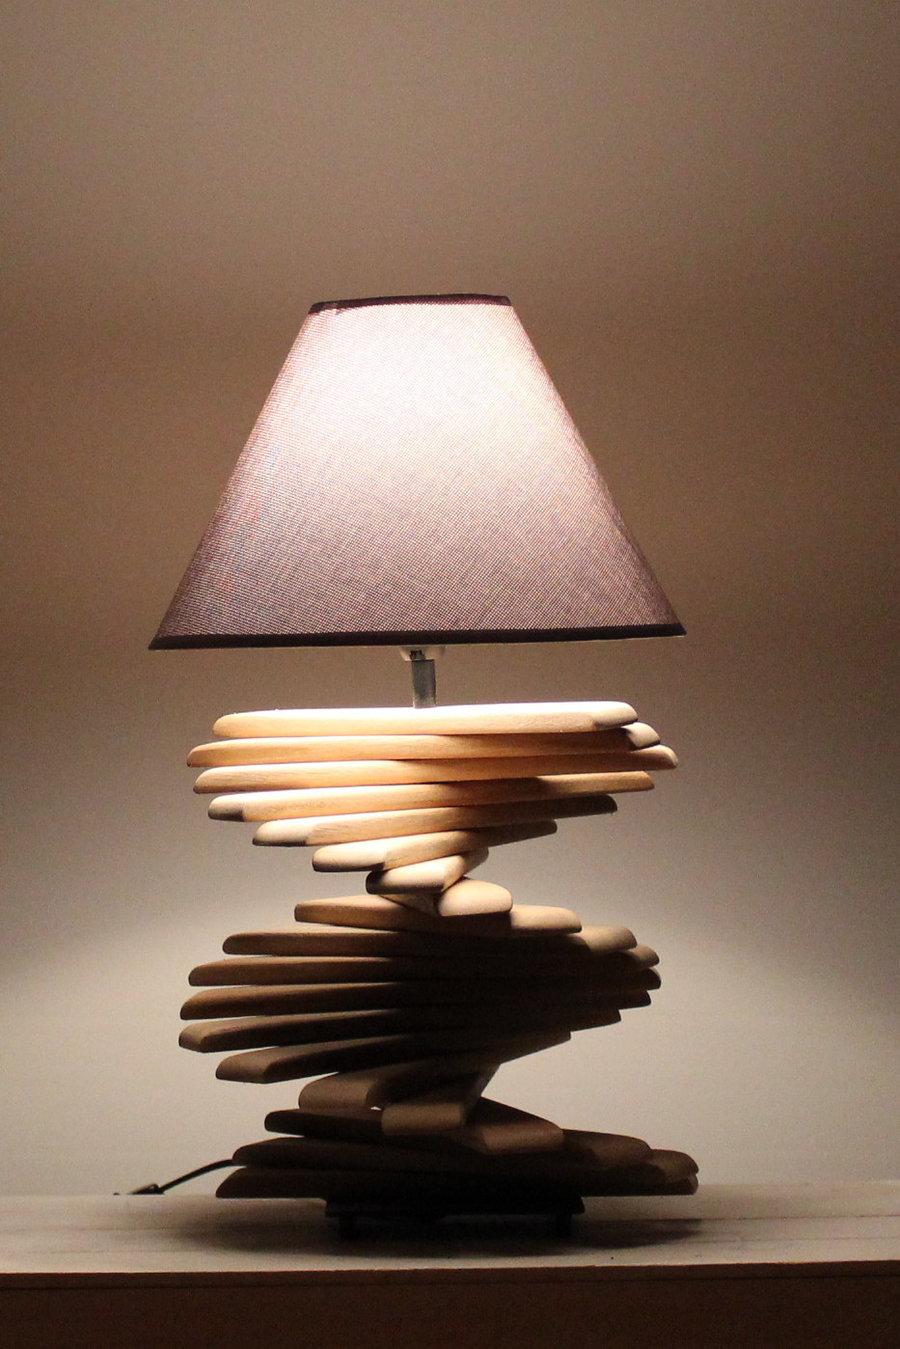 Lampe mit Leisten.